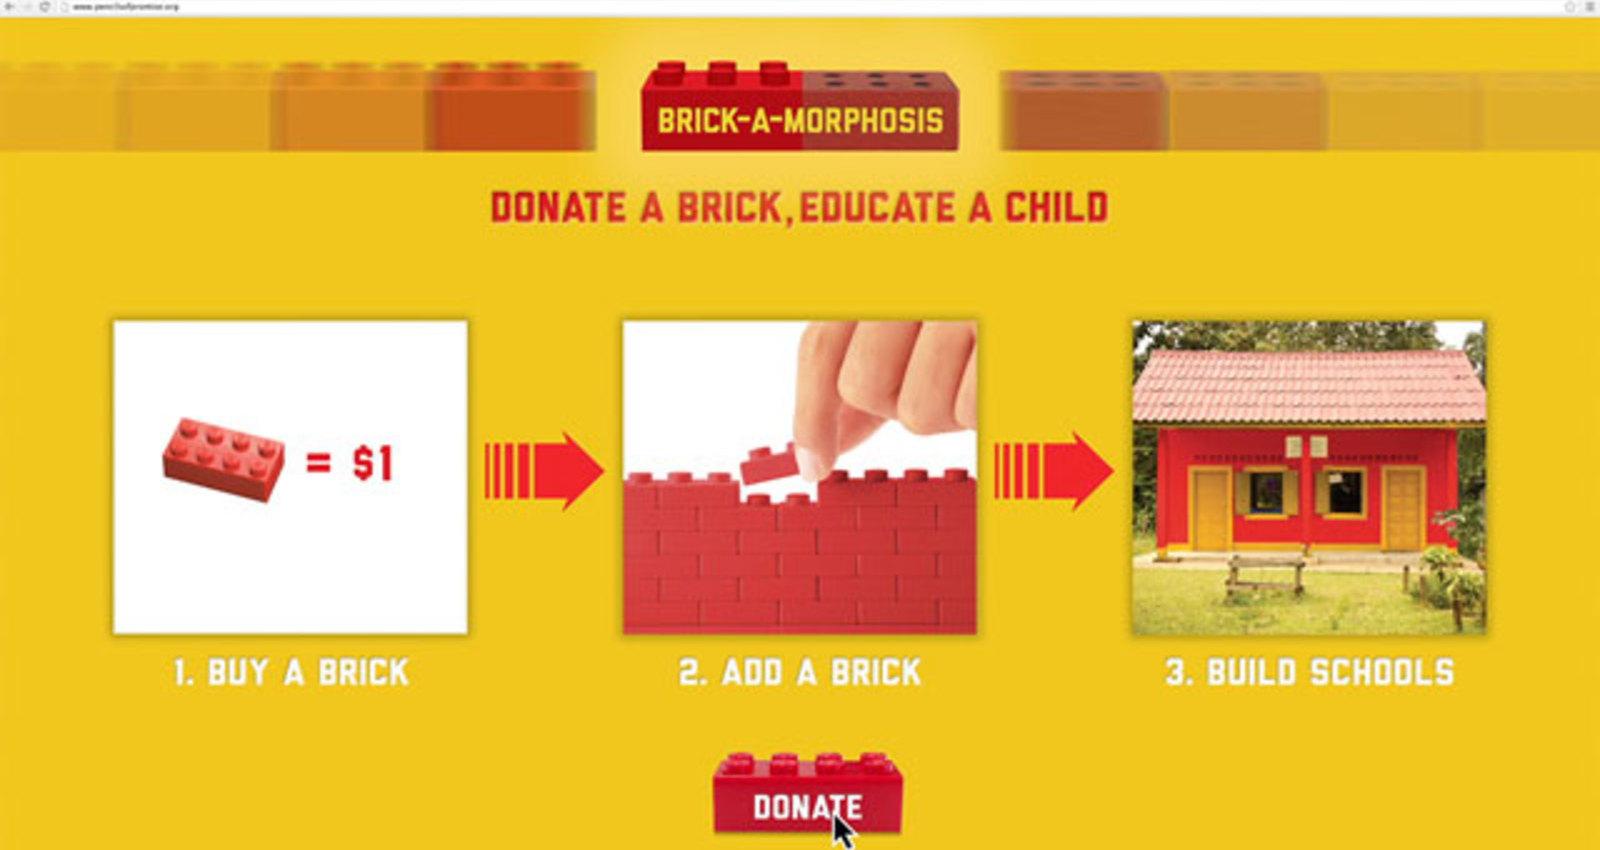 Brick-A-Morphosis